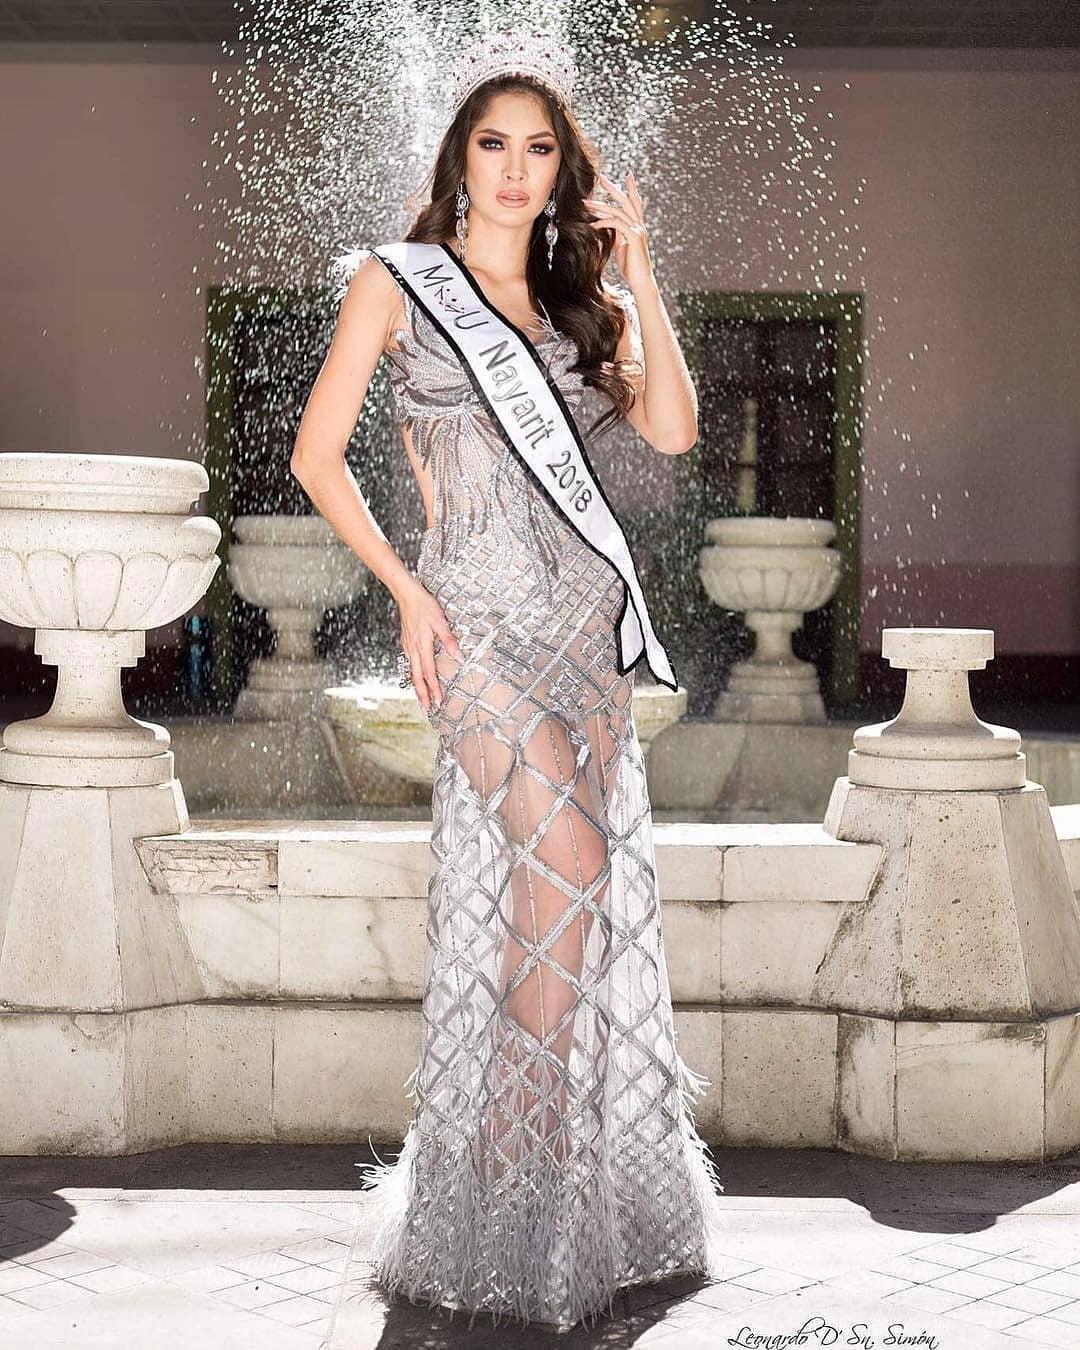 yuridia duran, miss mexico internacional 2020. 53067910